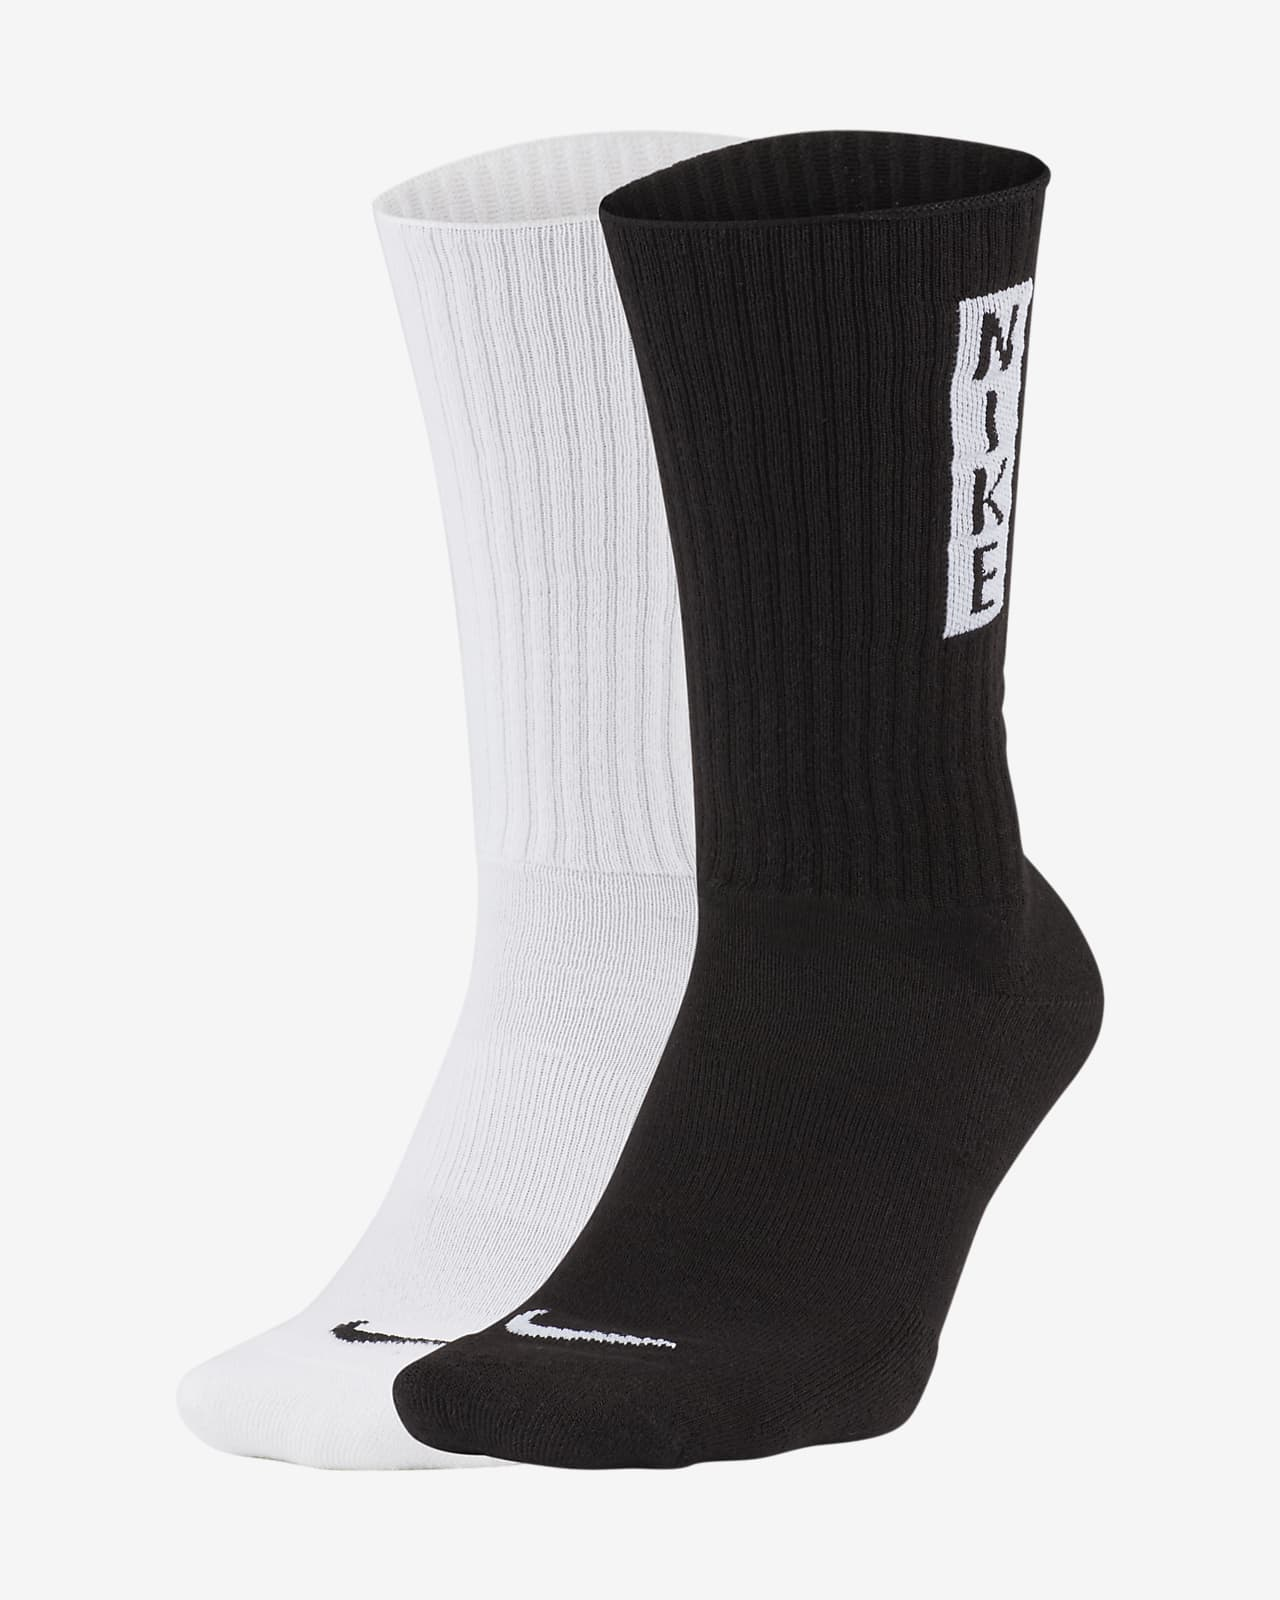 Nike Heritage Calcetines largos (2 pares)